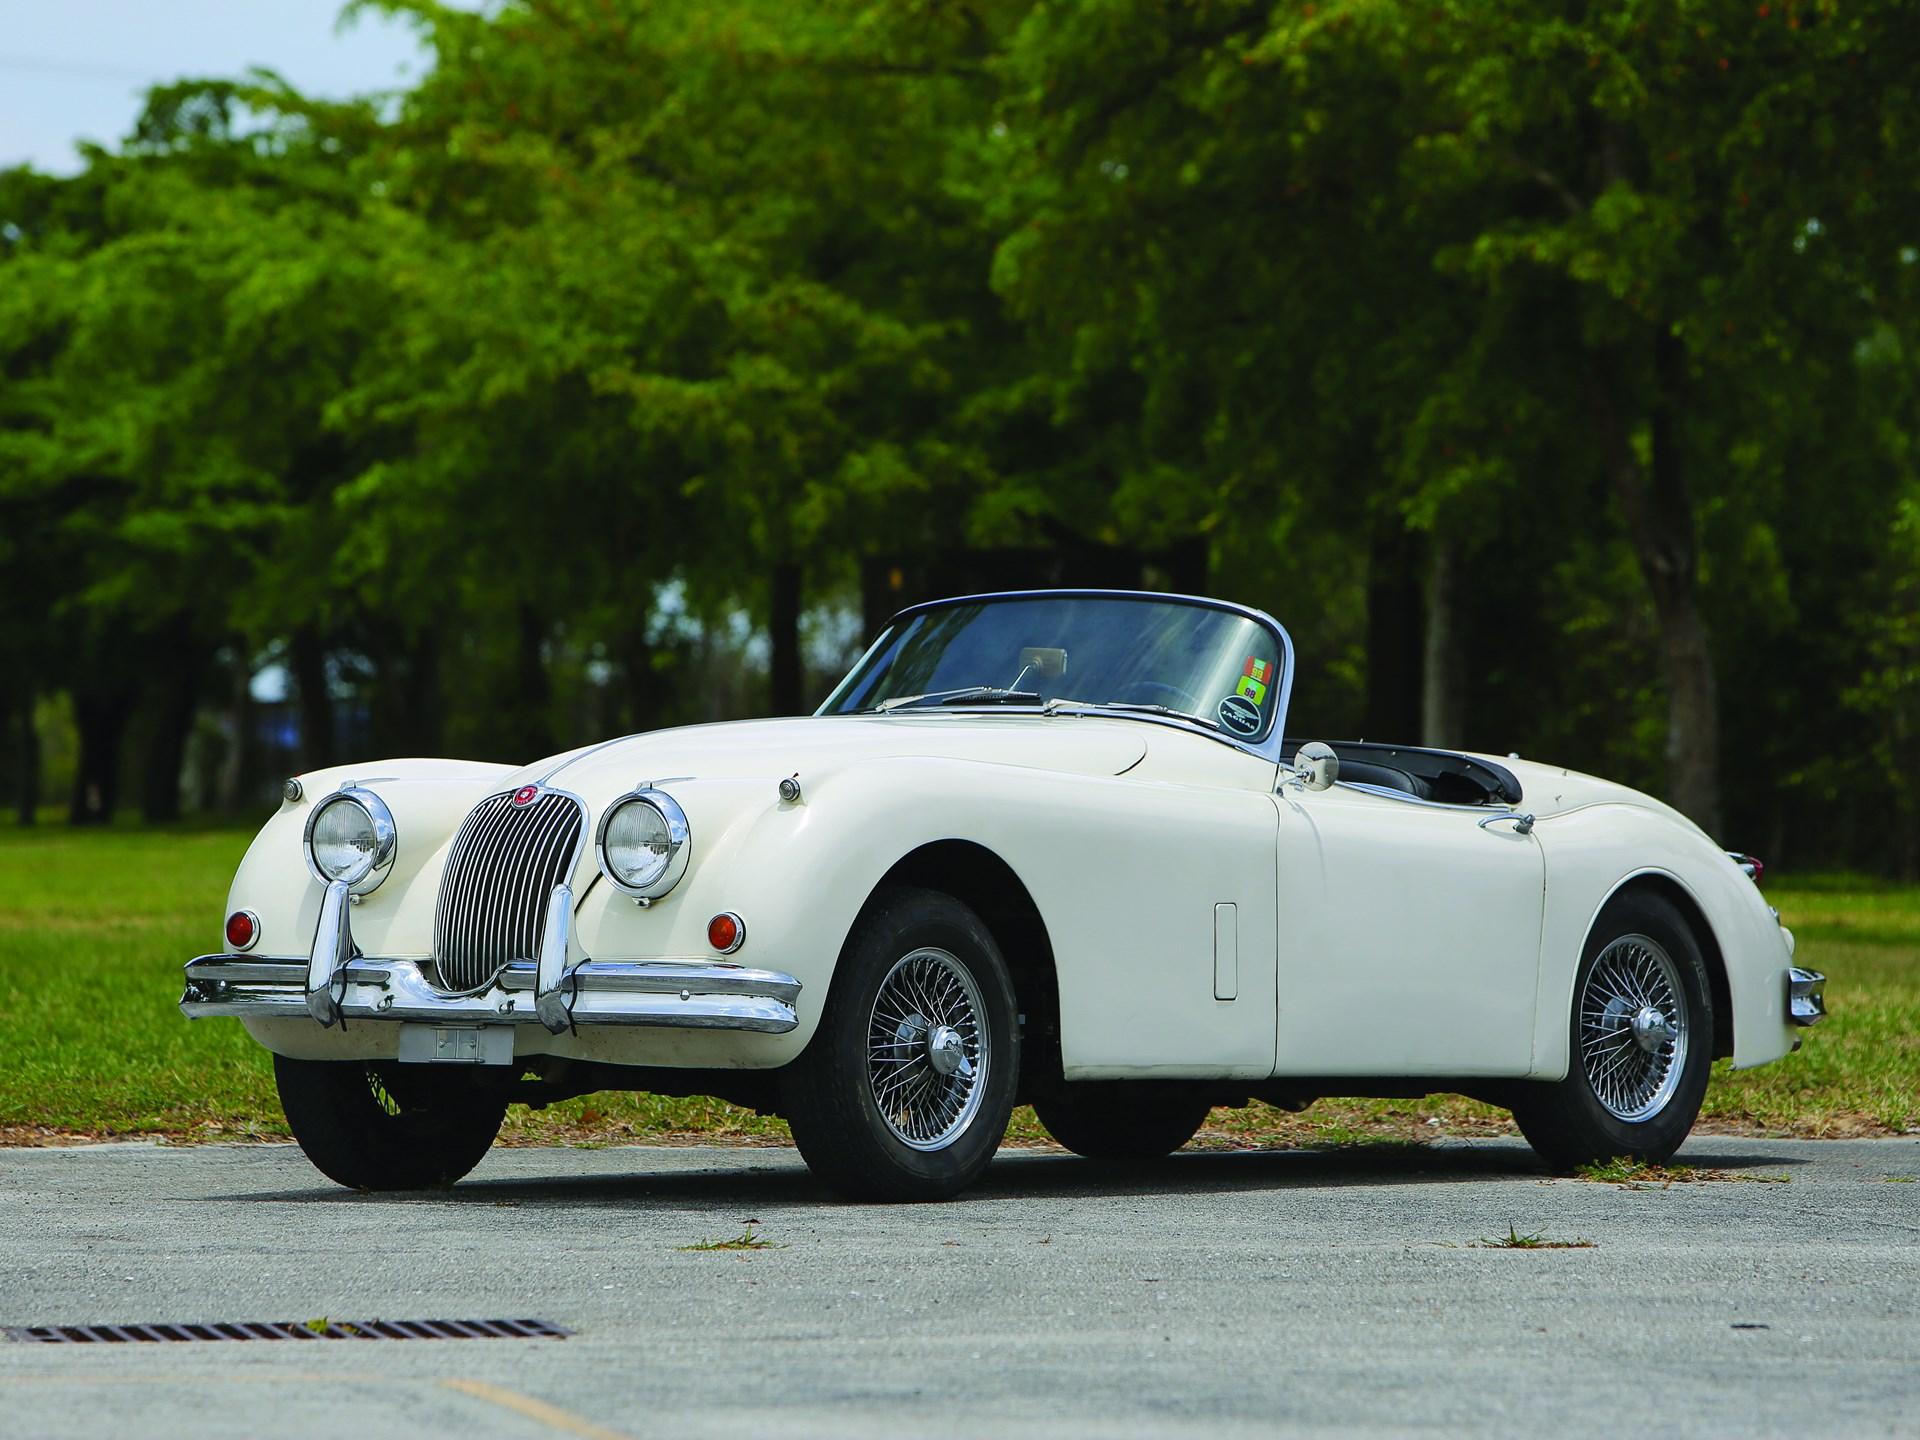 1958 Jaguar XK 150S